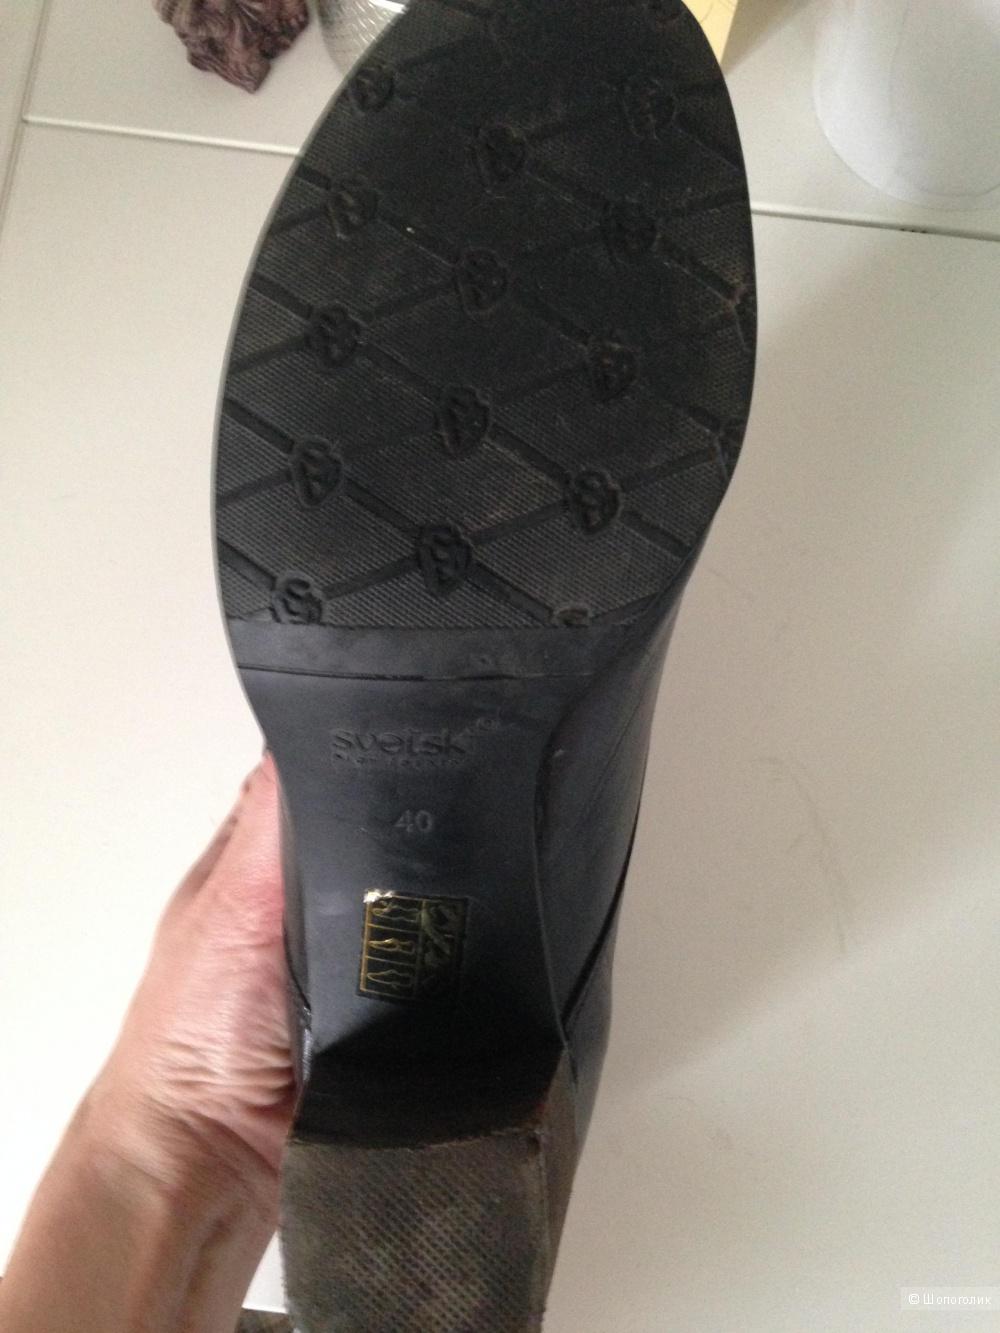 Ботинки на весну Svetski, размер 40